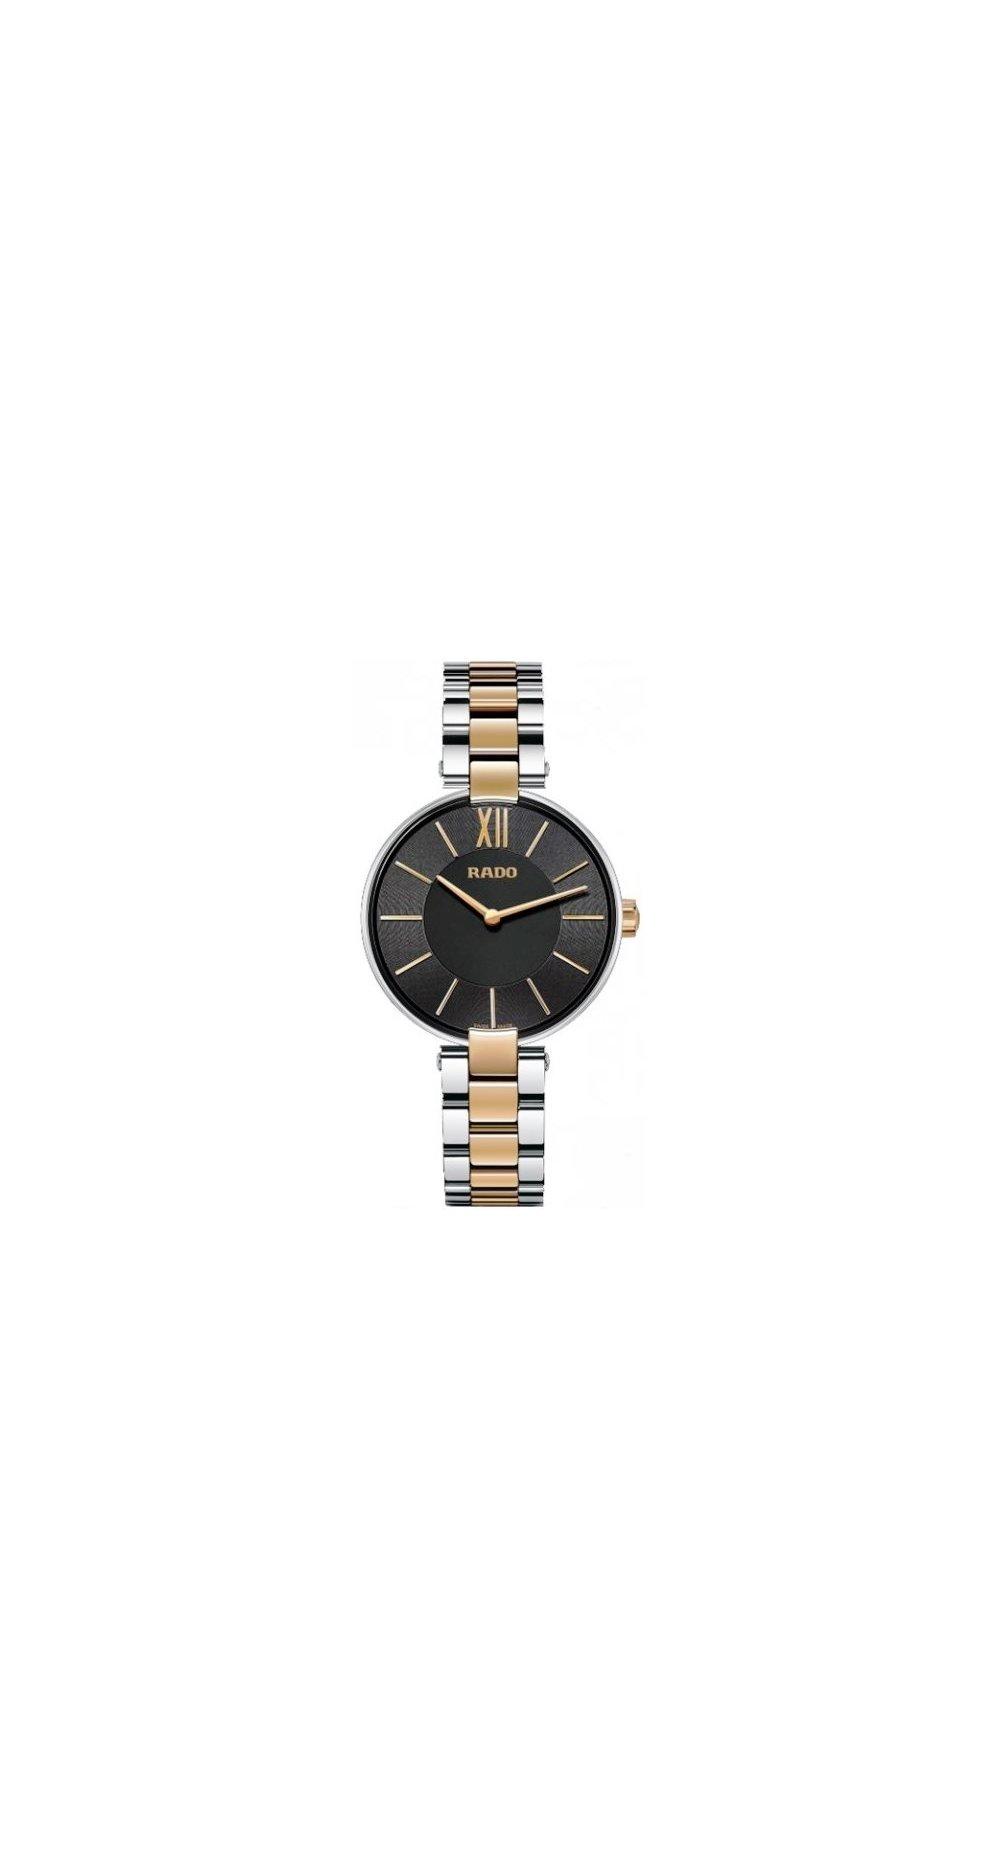 Rado Coupole Two-Tone Ladies Watch R22850163